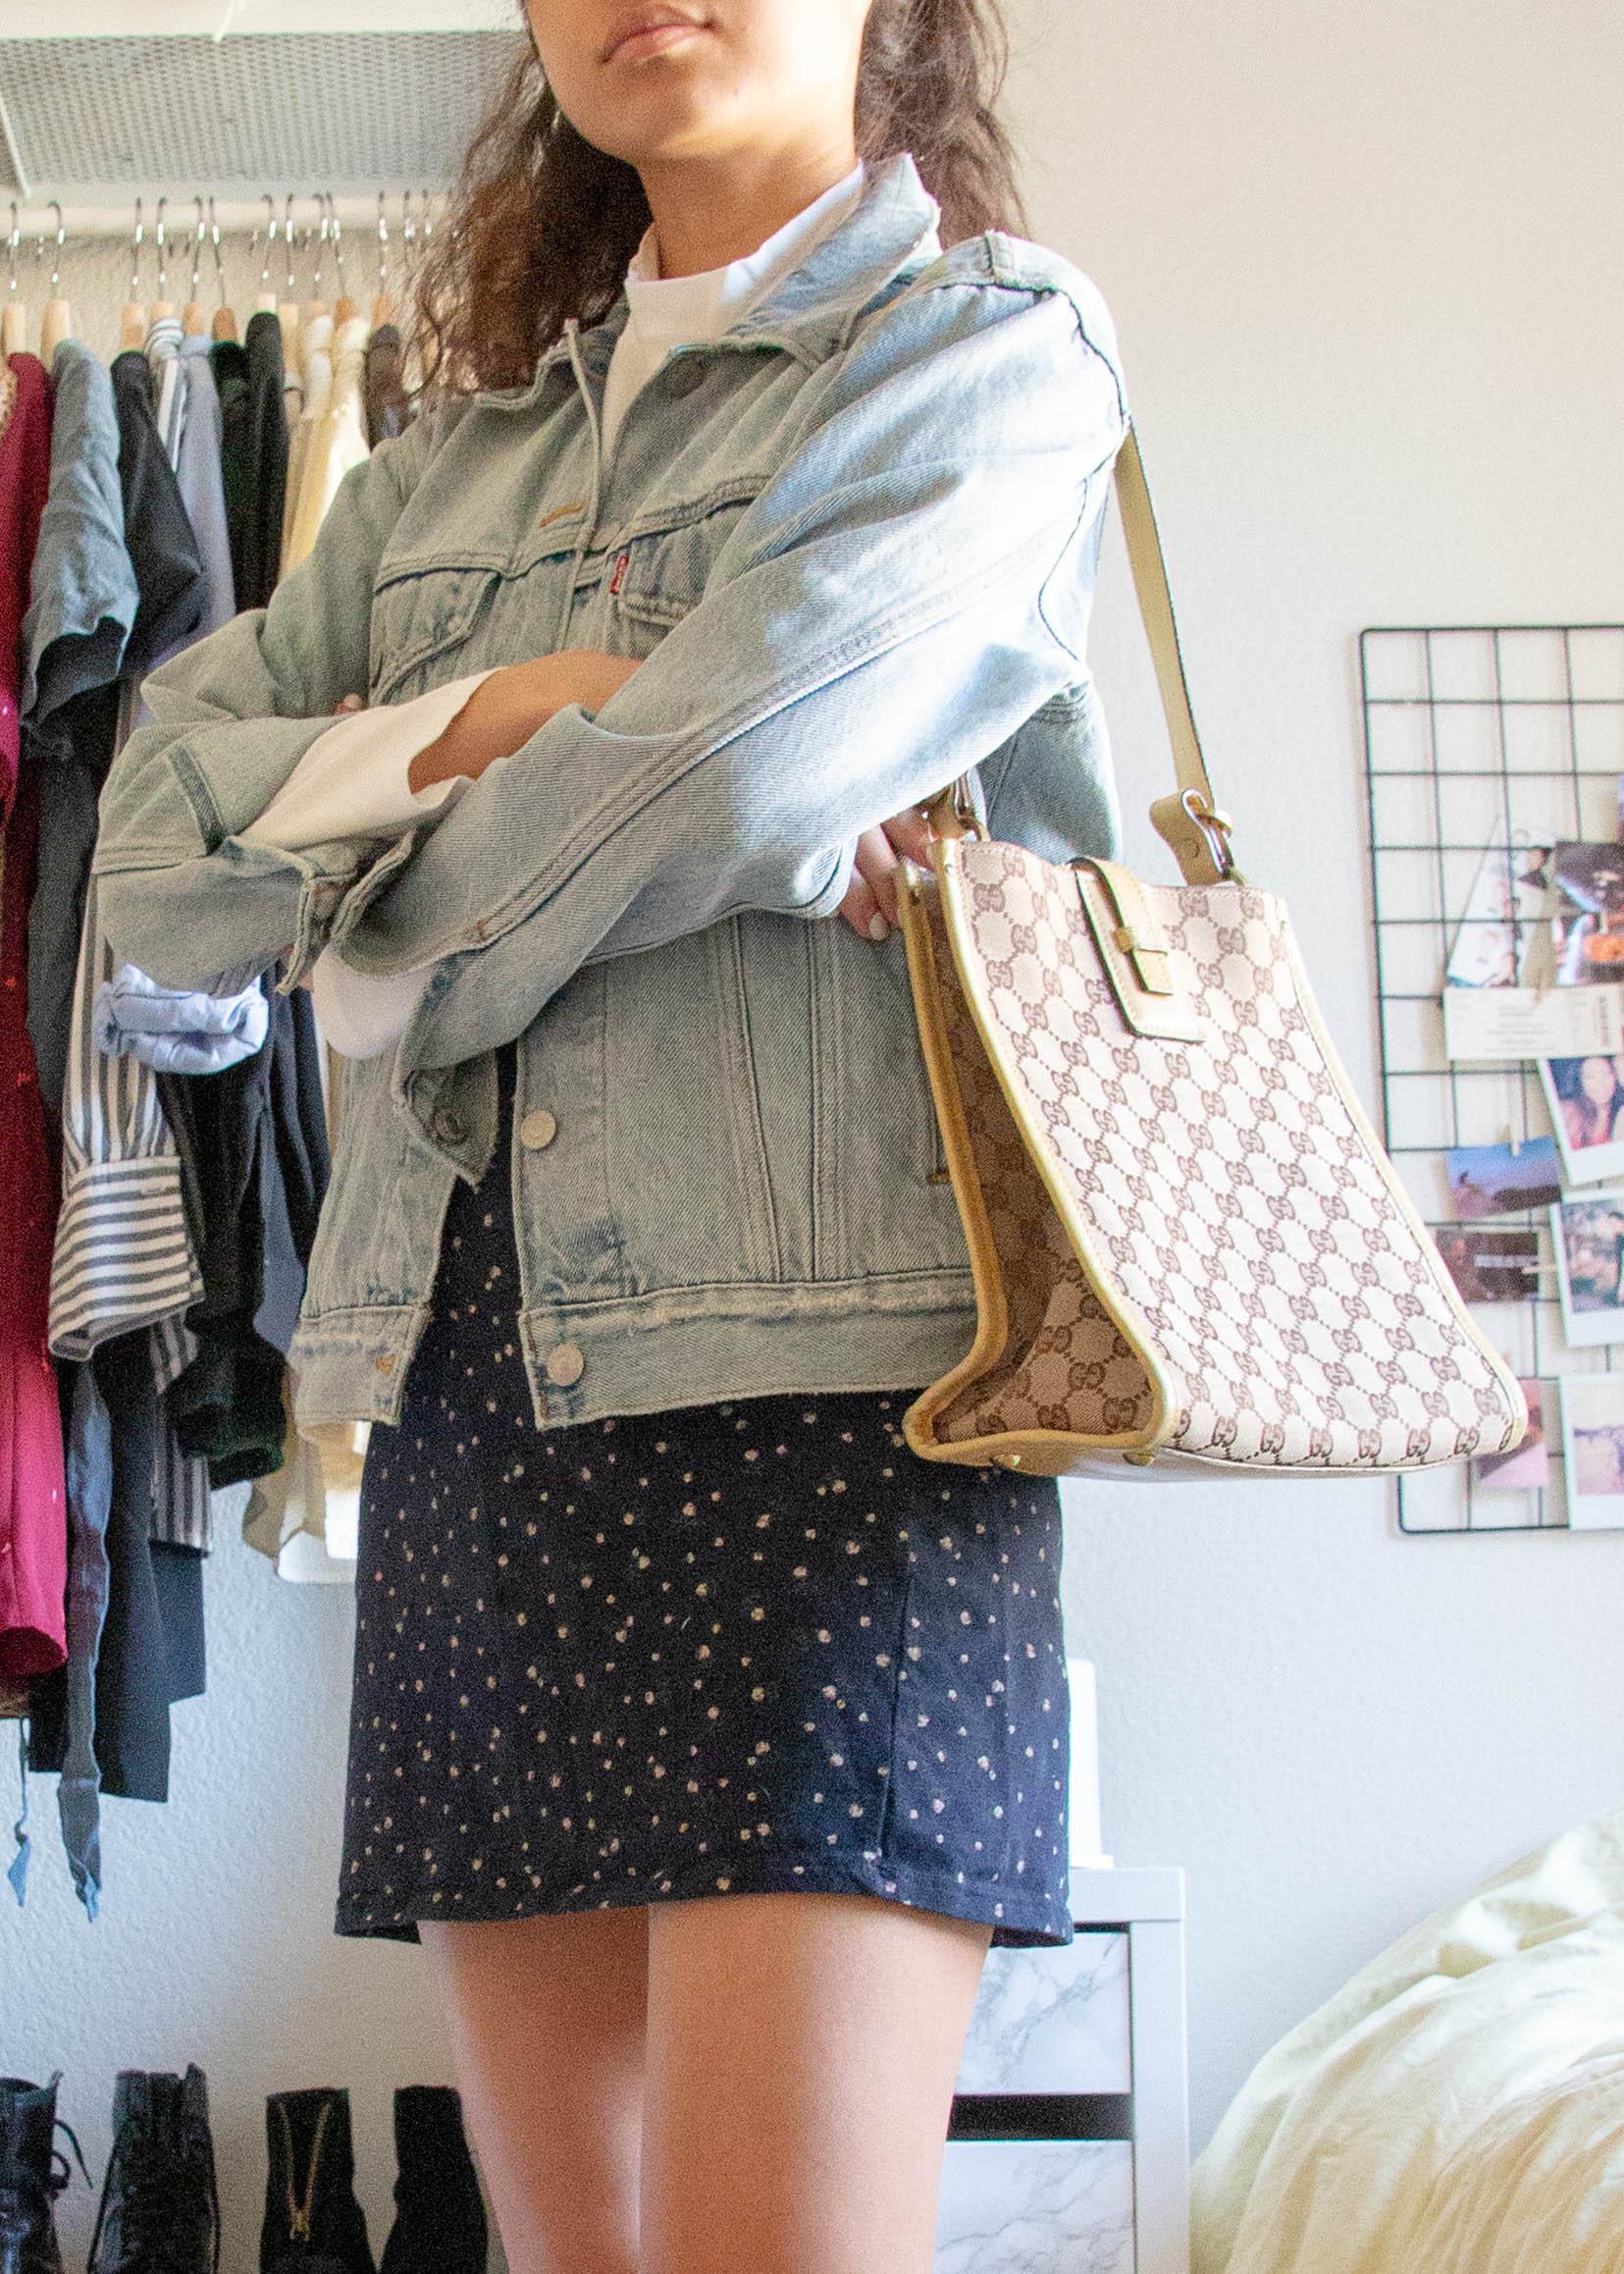 the mini dress - long sleeved shirt - everlane*dress - brandy melvilleboots - doc martensbag - vintage